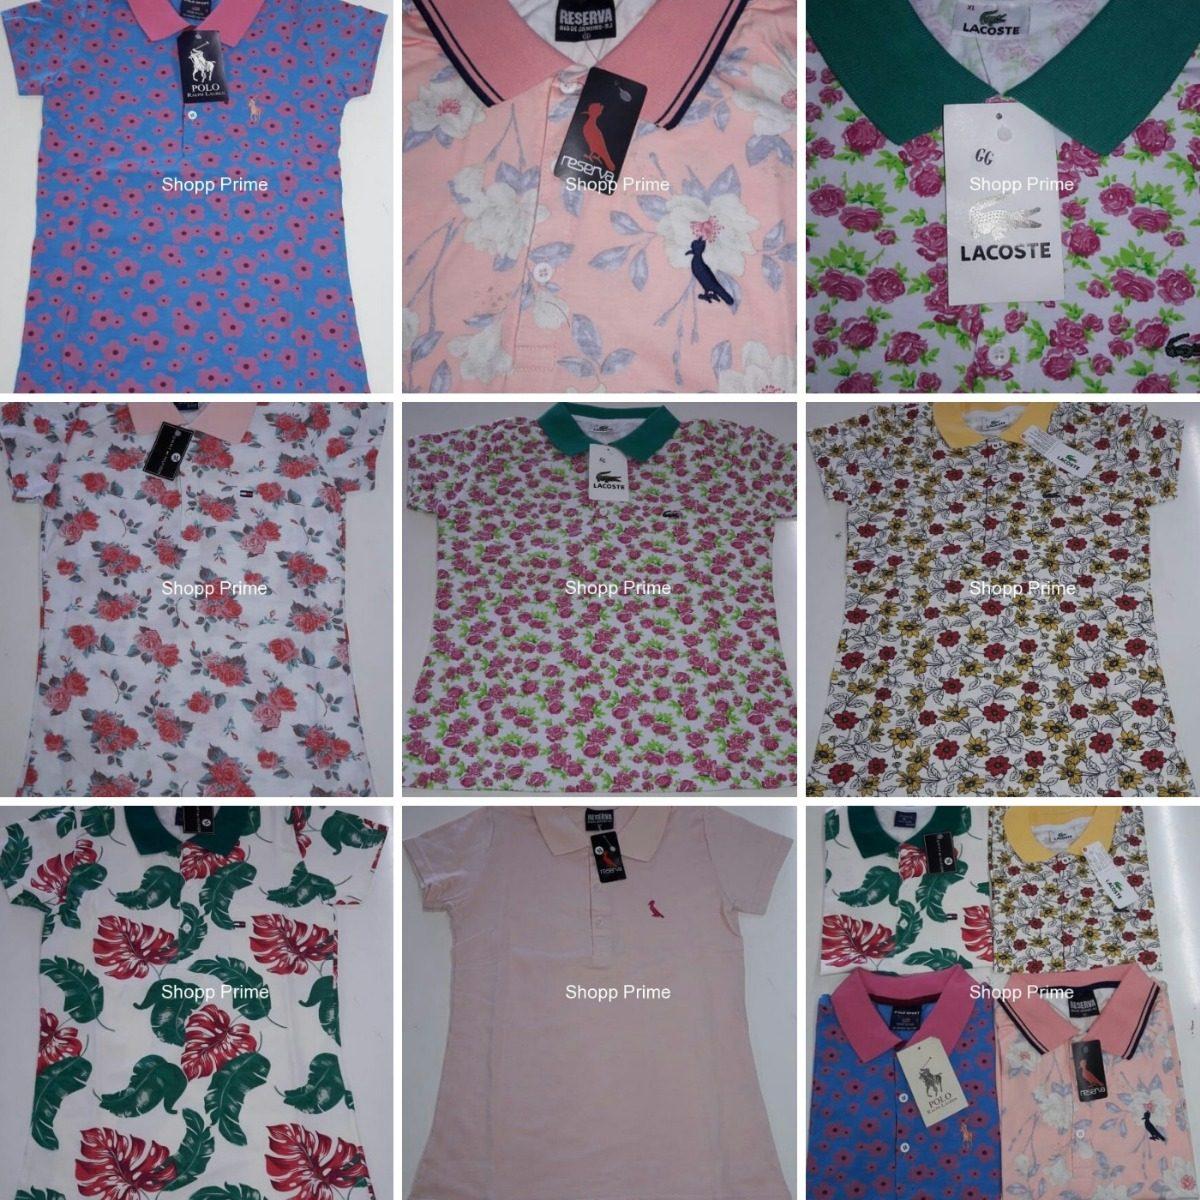 kit 10 camisas polo feminina marcas famosas revenda atacado. Carregando  zoom. a79417e00d0a4